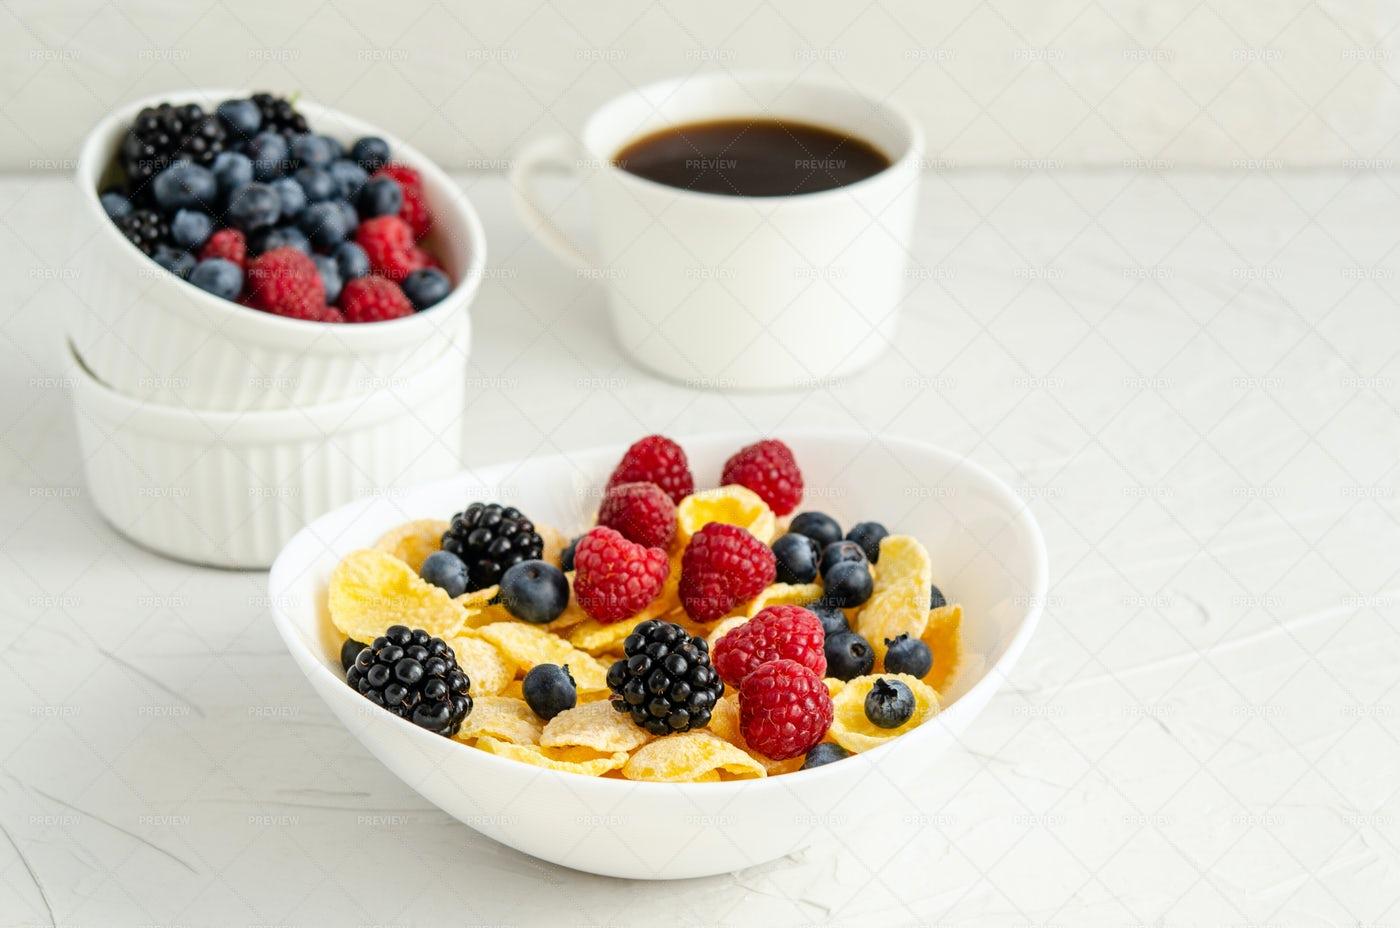 Cornflakes With Berries: Stock Photos